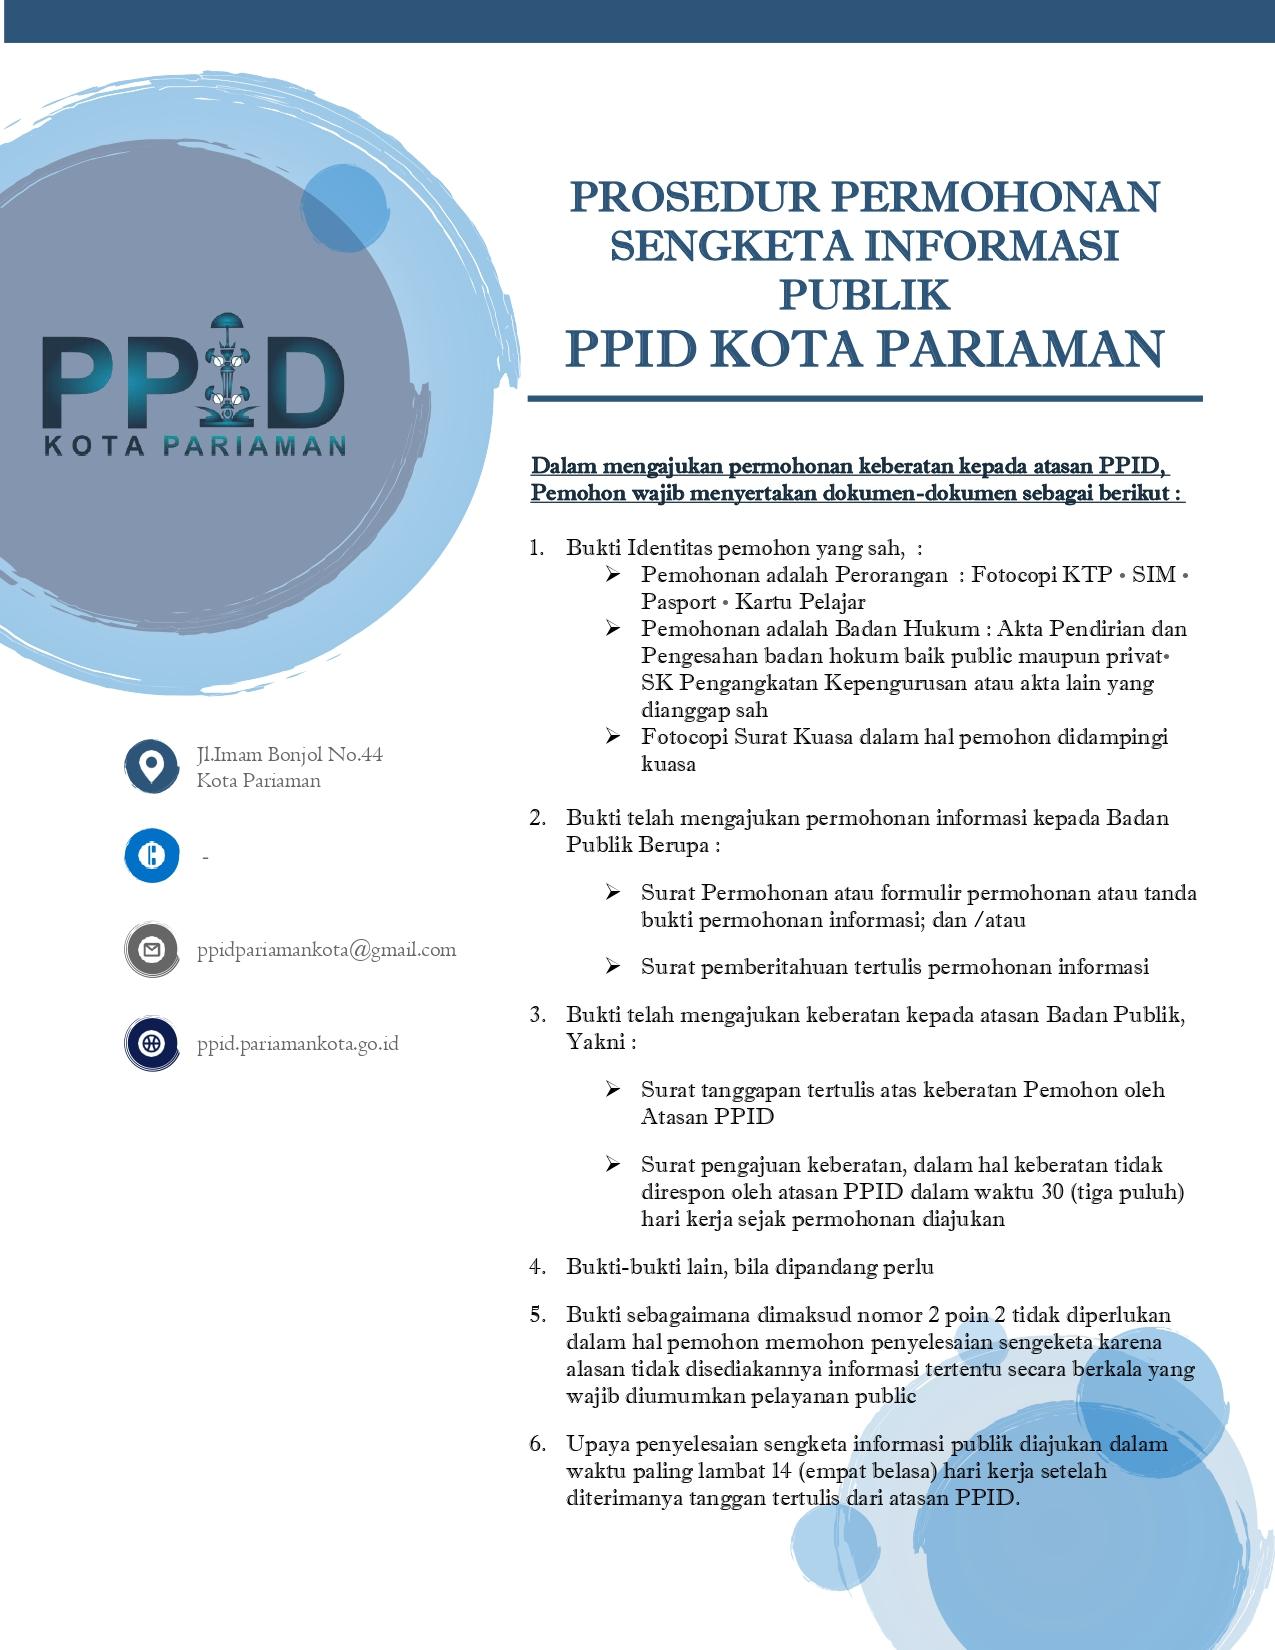 Prosedur Permohonan Sengketa Informasi Publik